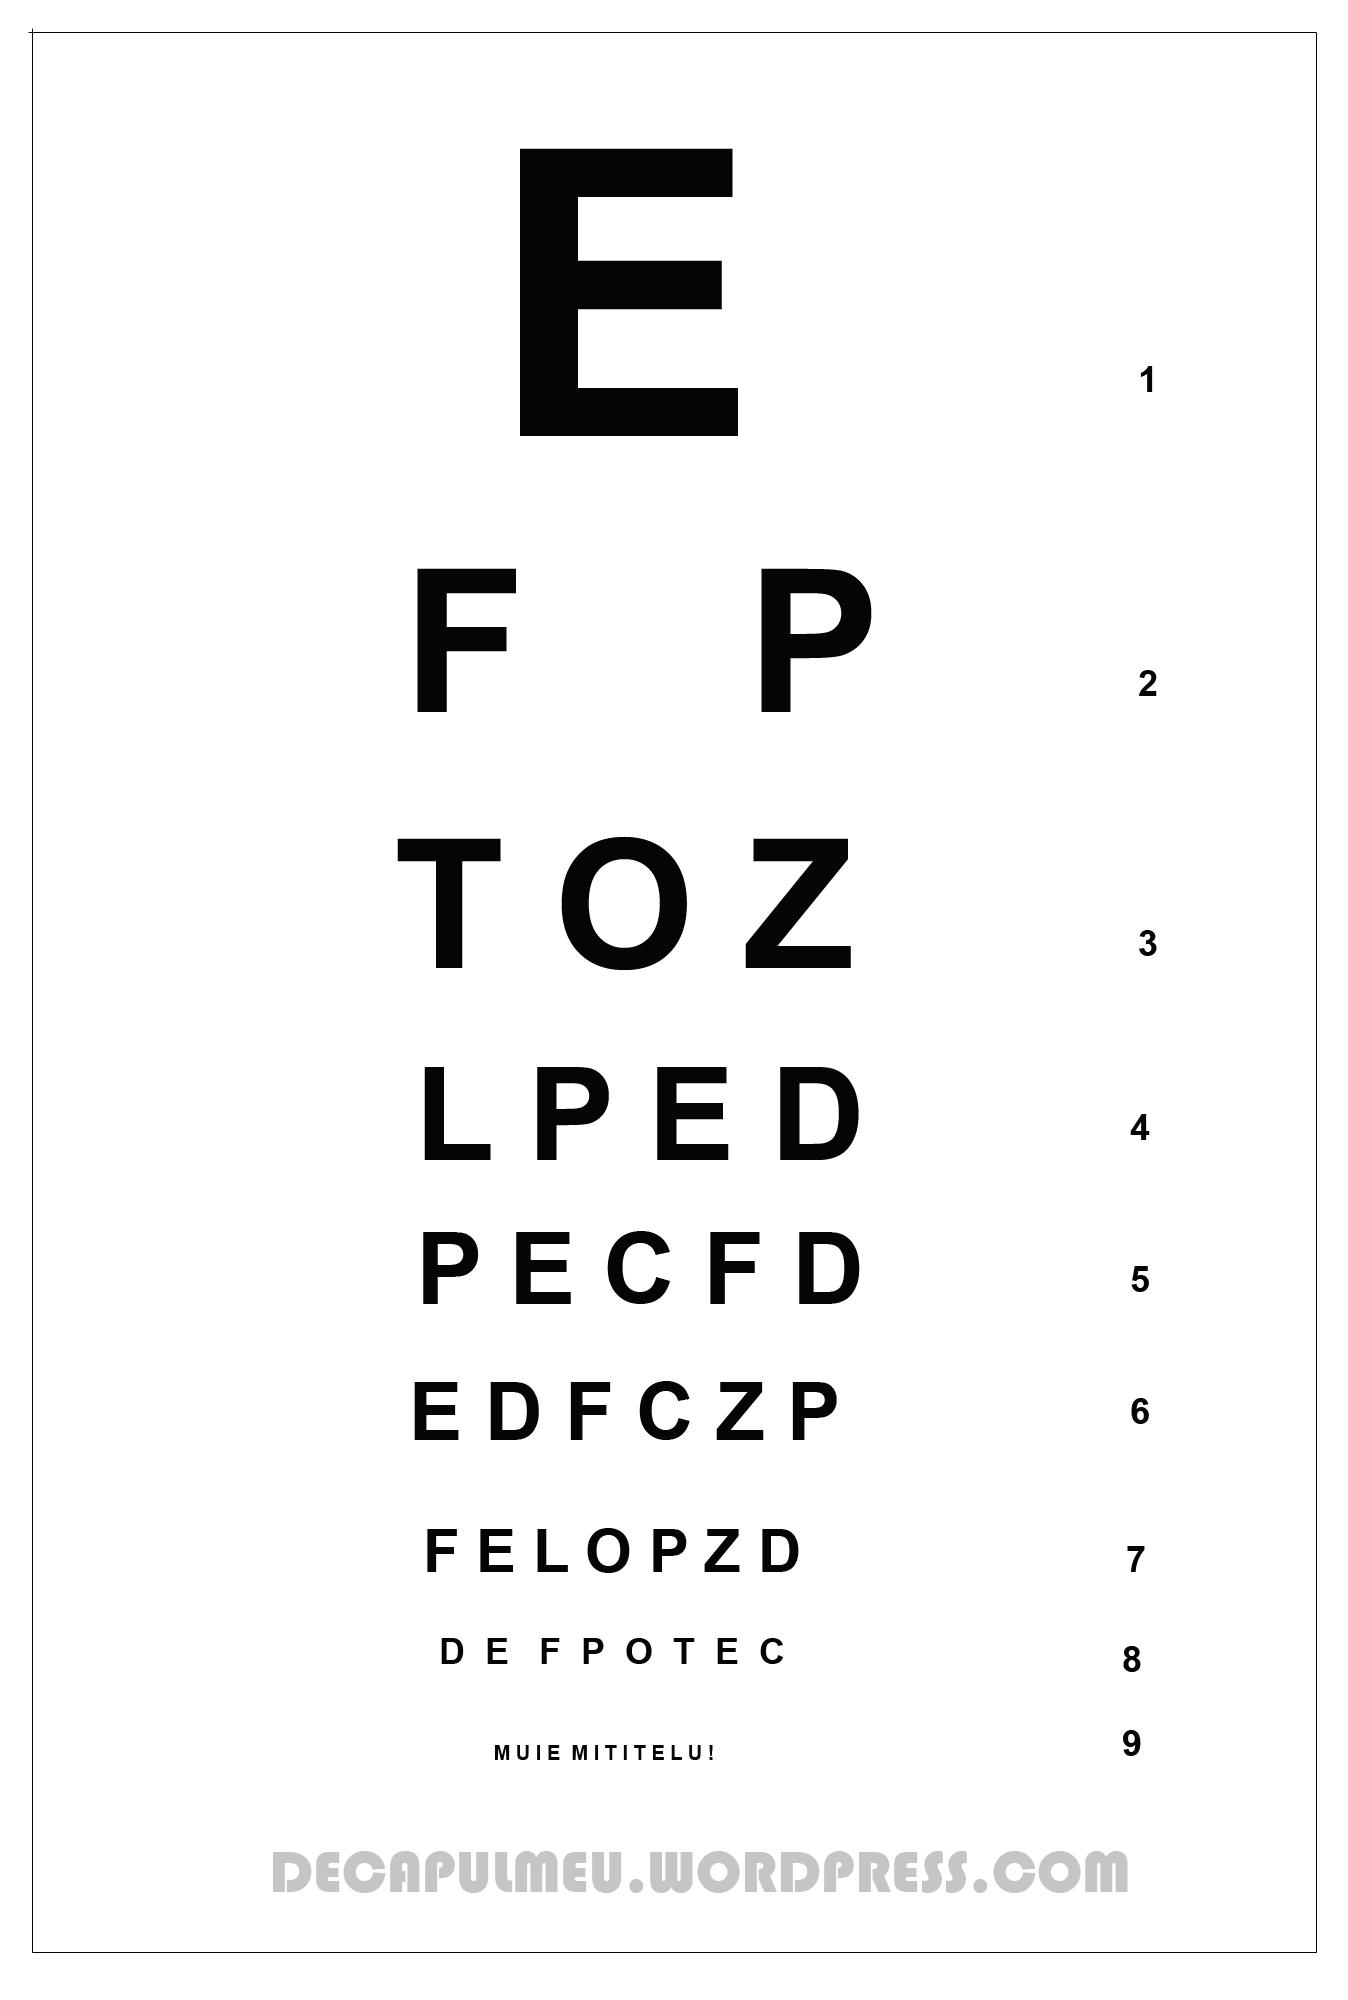 Examen oftalmologic pentru ochelari de soare. Scuzați